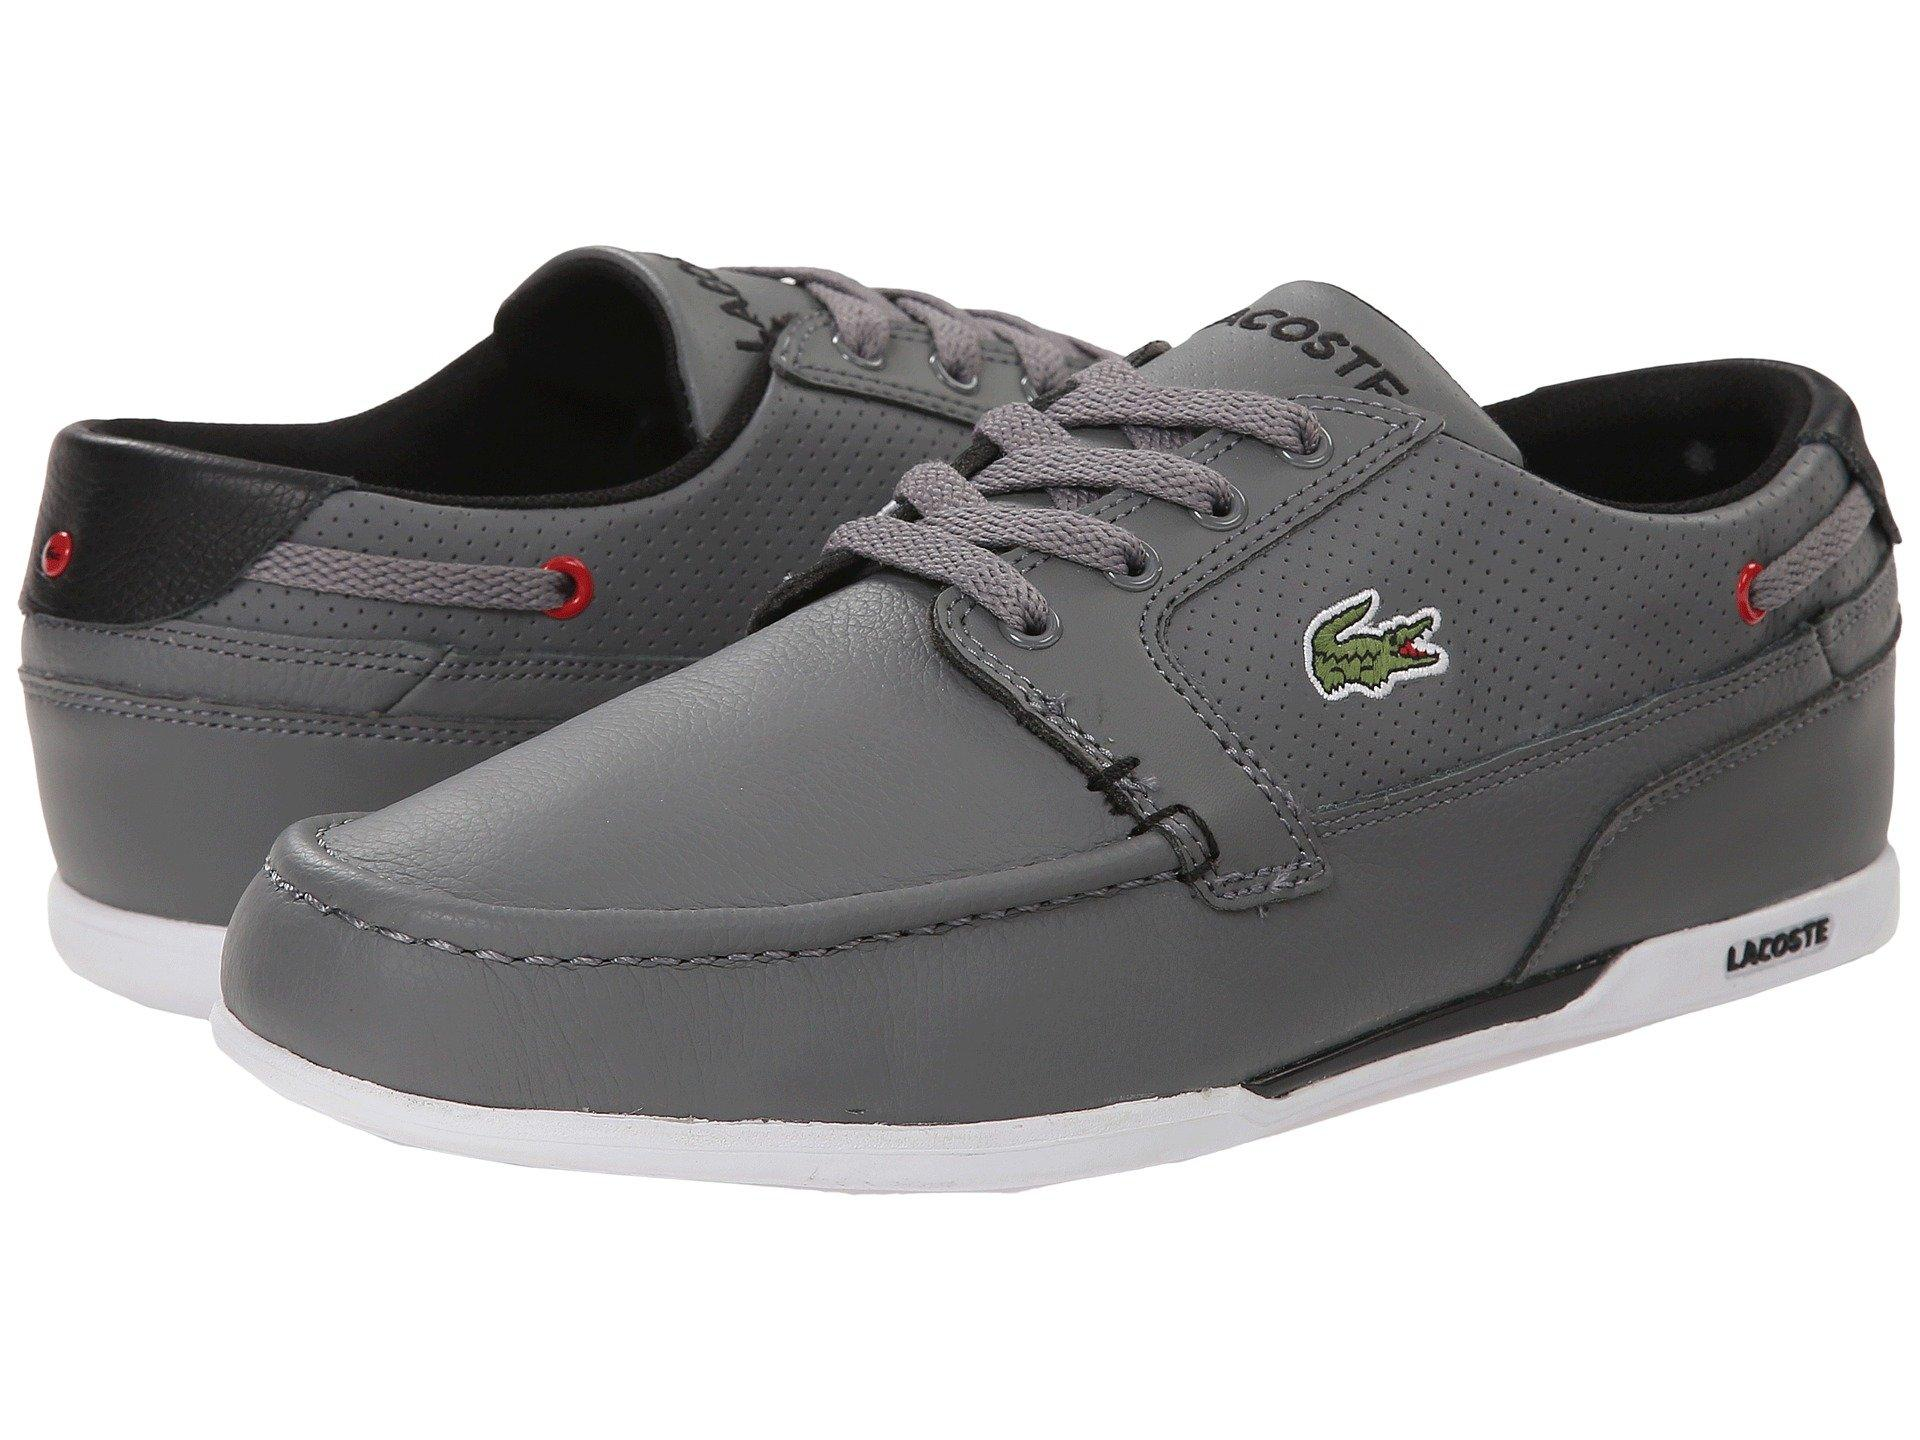 bb120f7fb816fd Lyst - Lacoste Dreyfus Qs1 (grey black) Men s Shoes in Gray for Men